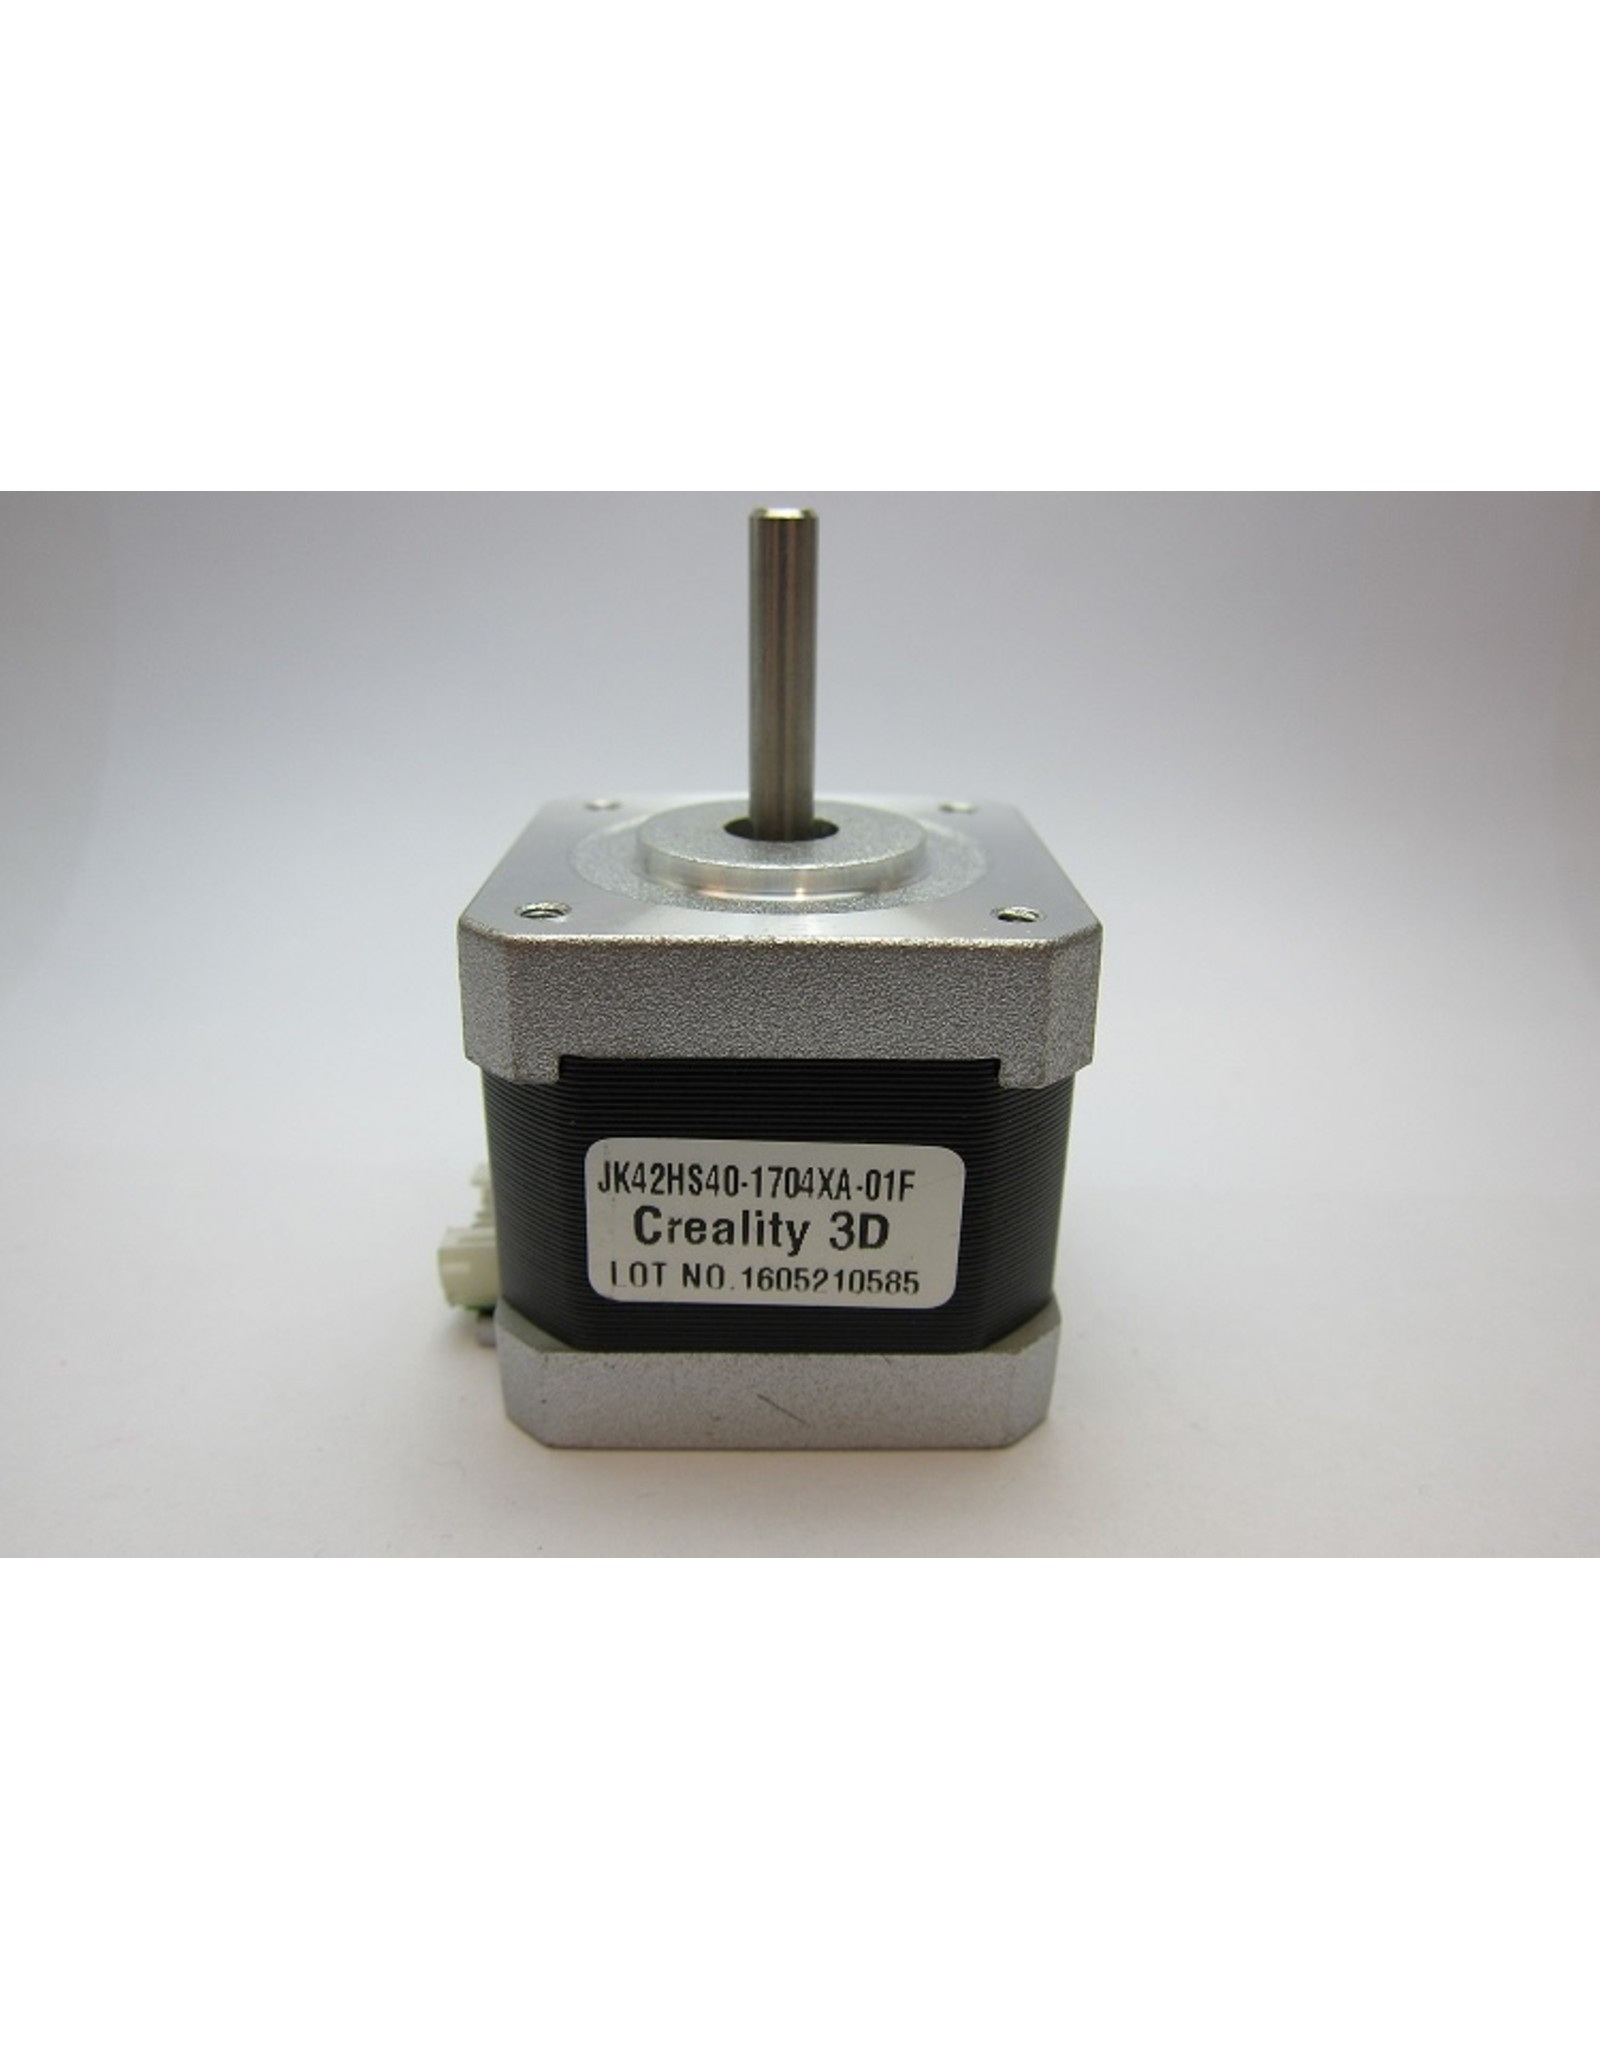 Creality/Ender Creality 3D 42-40 Stepper Motor